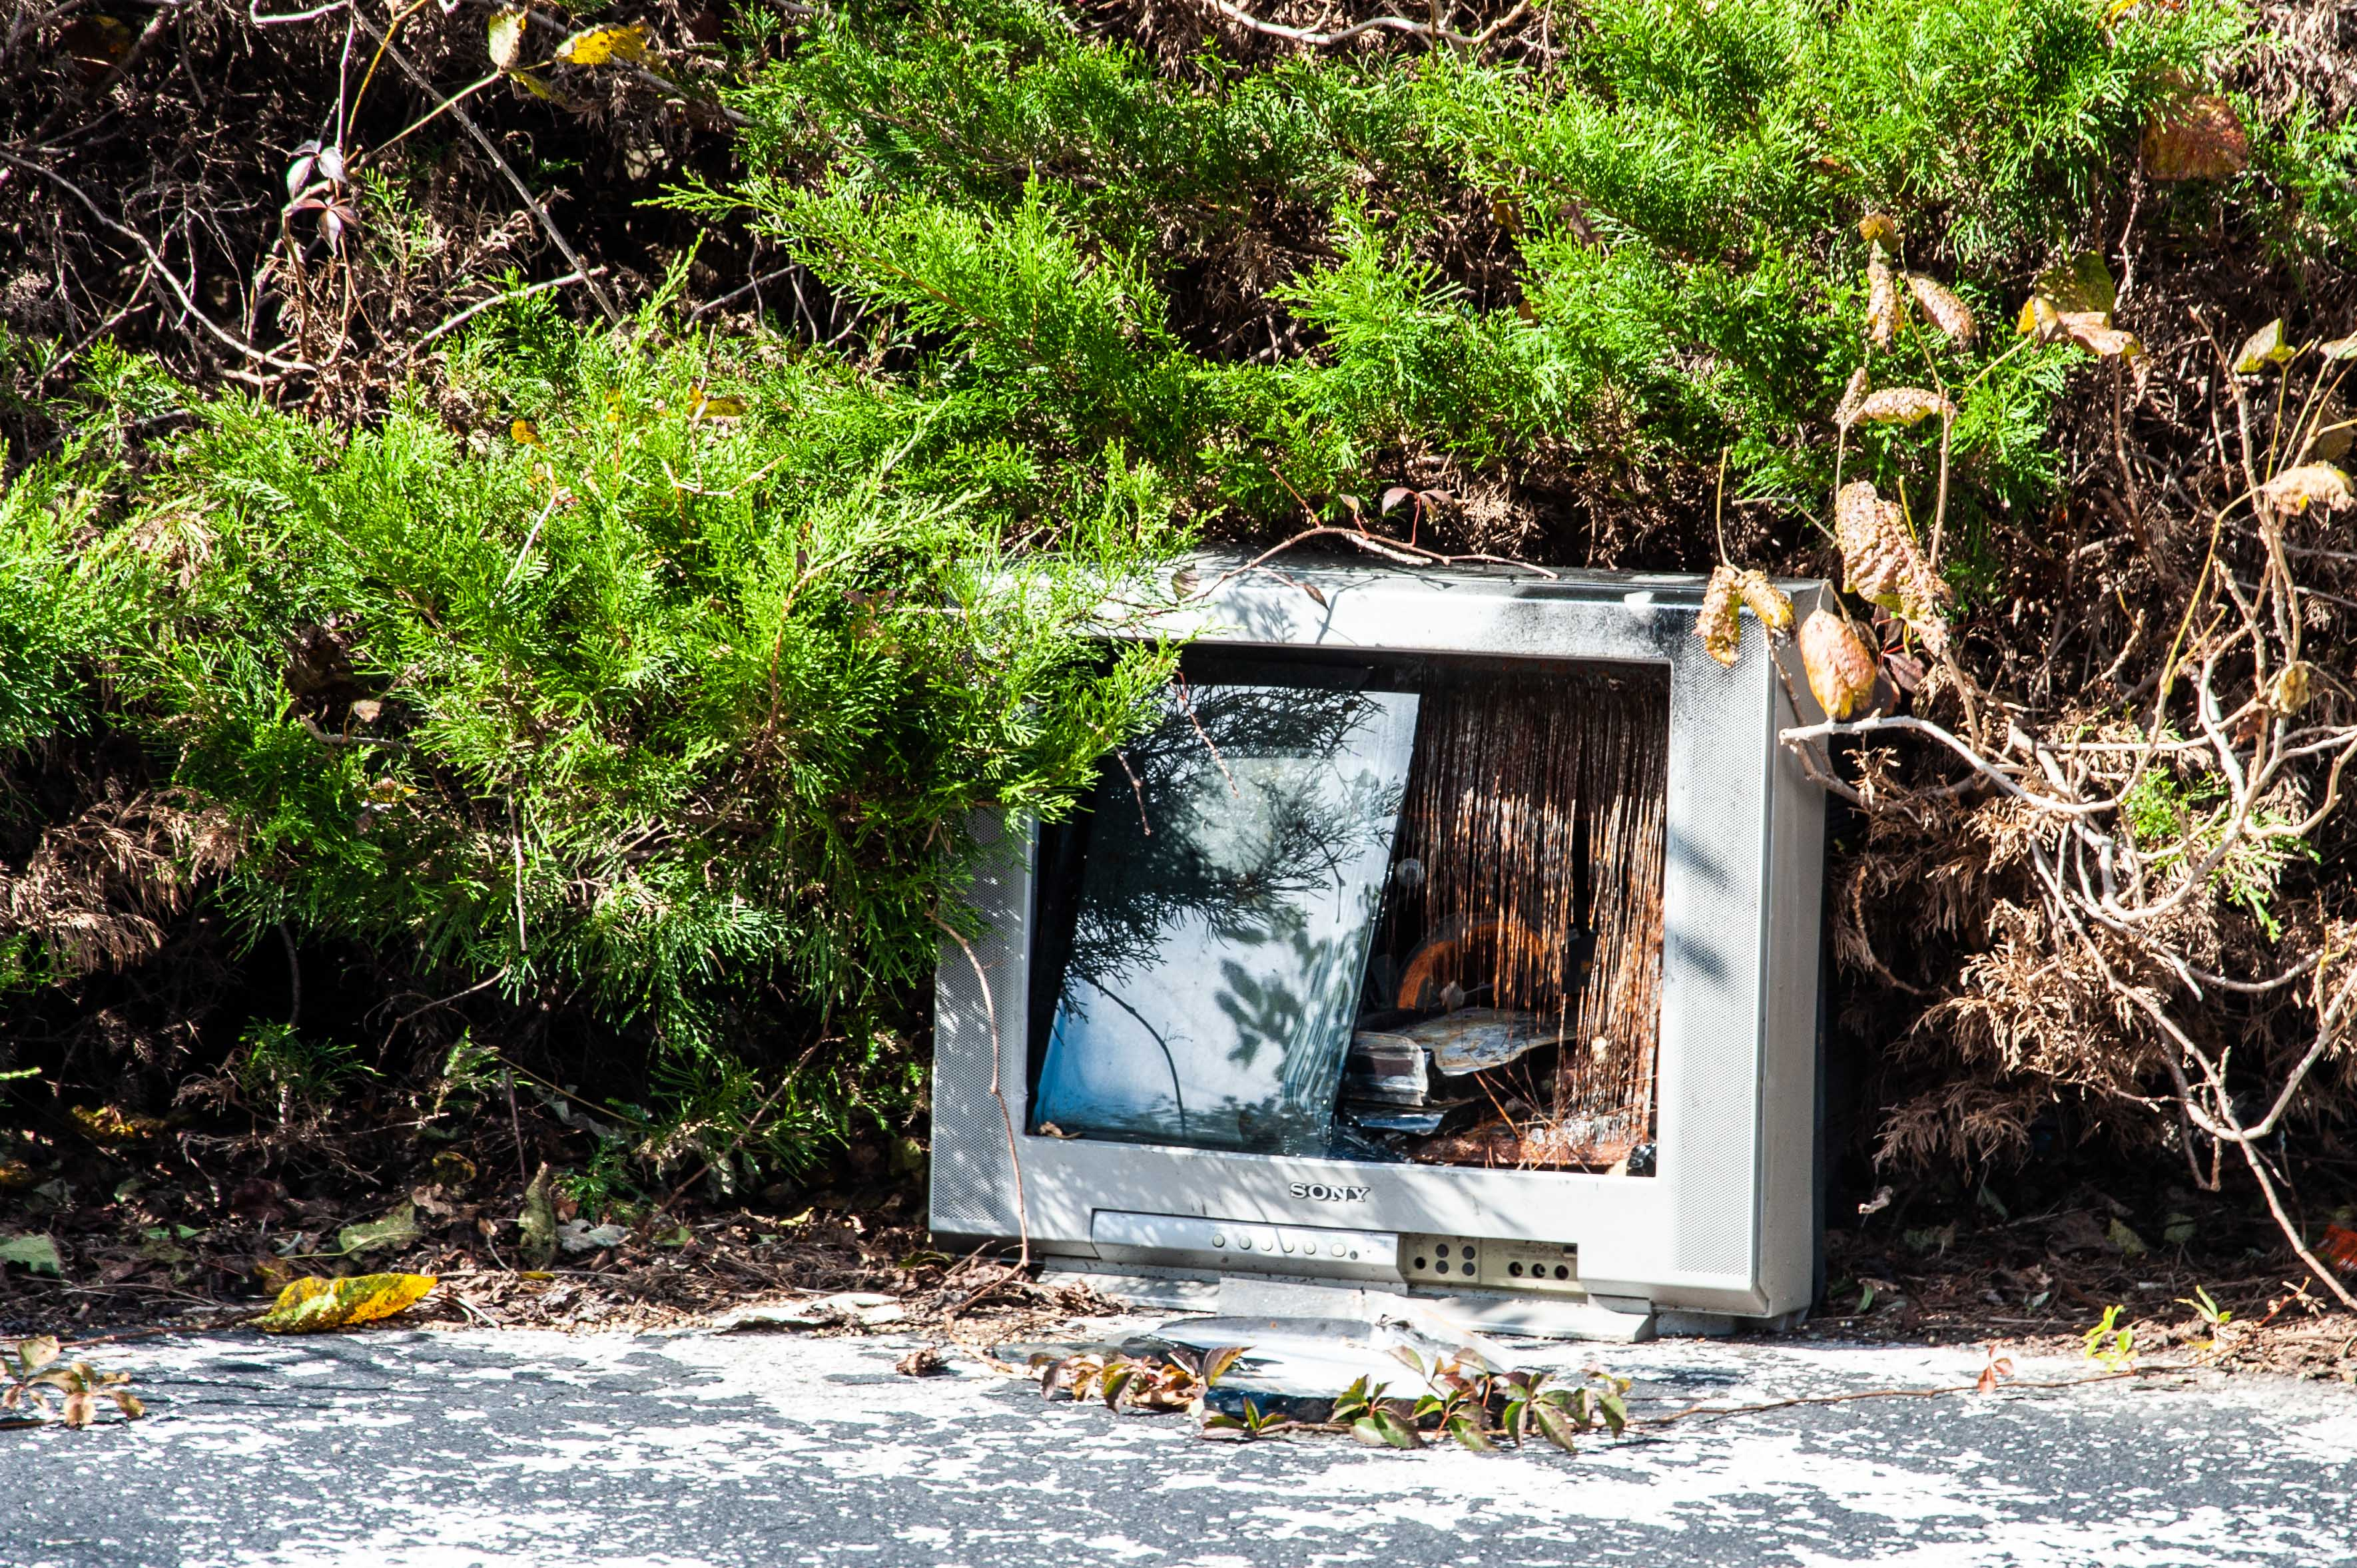 Binhammerphotographs roadside america